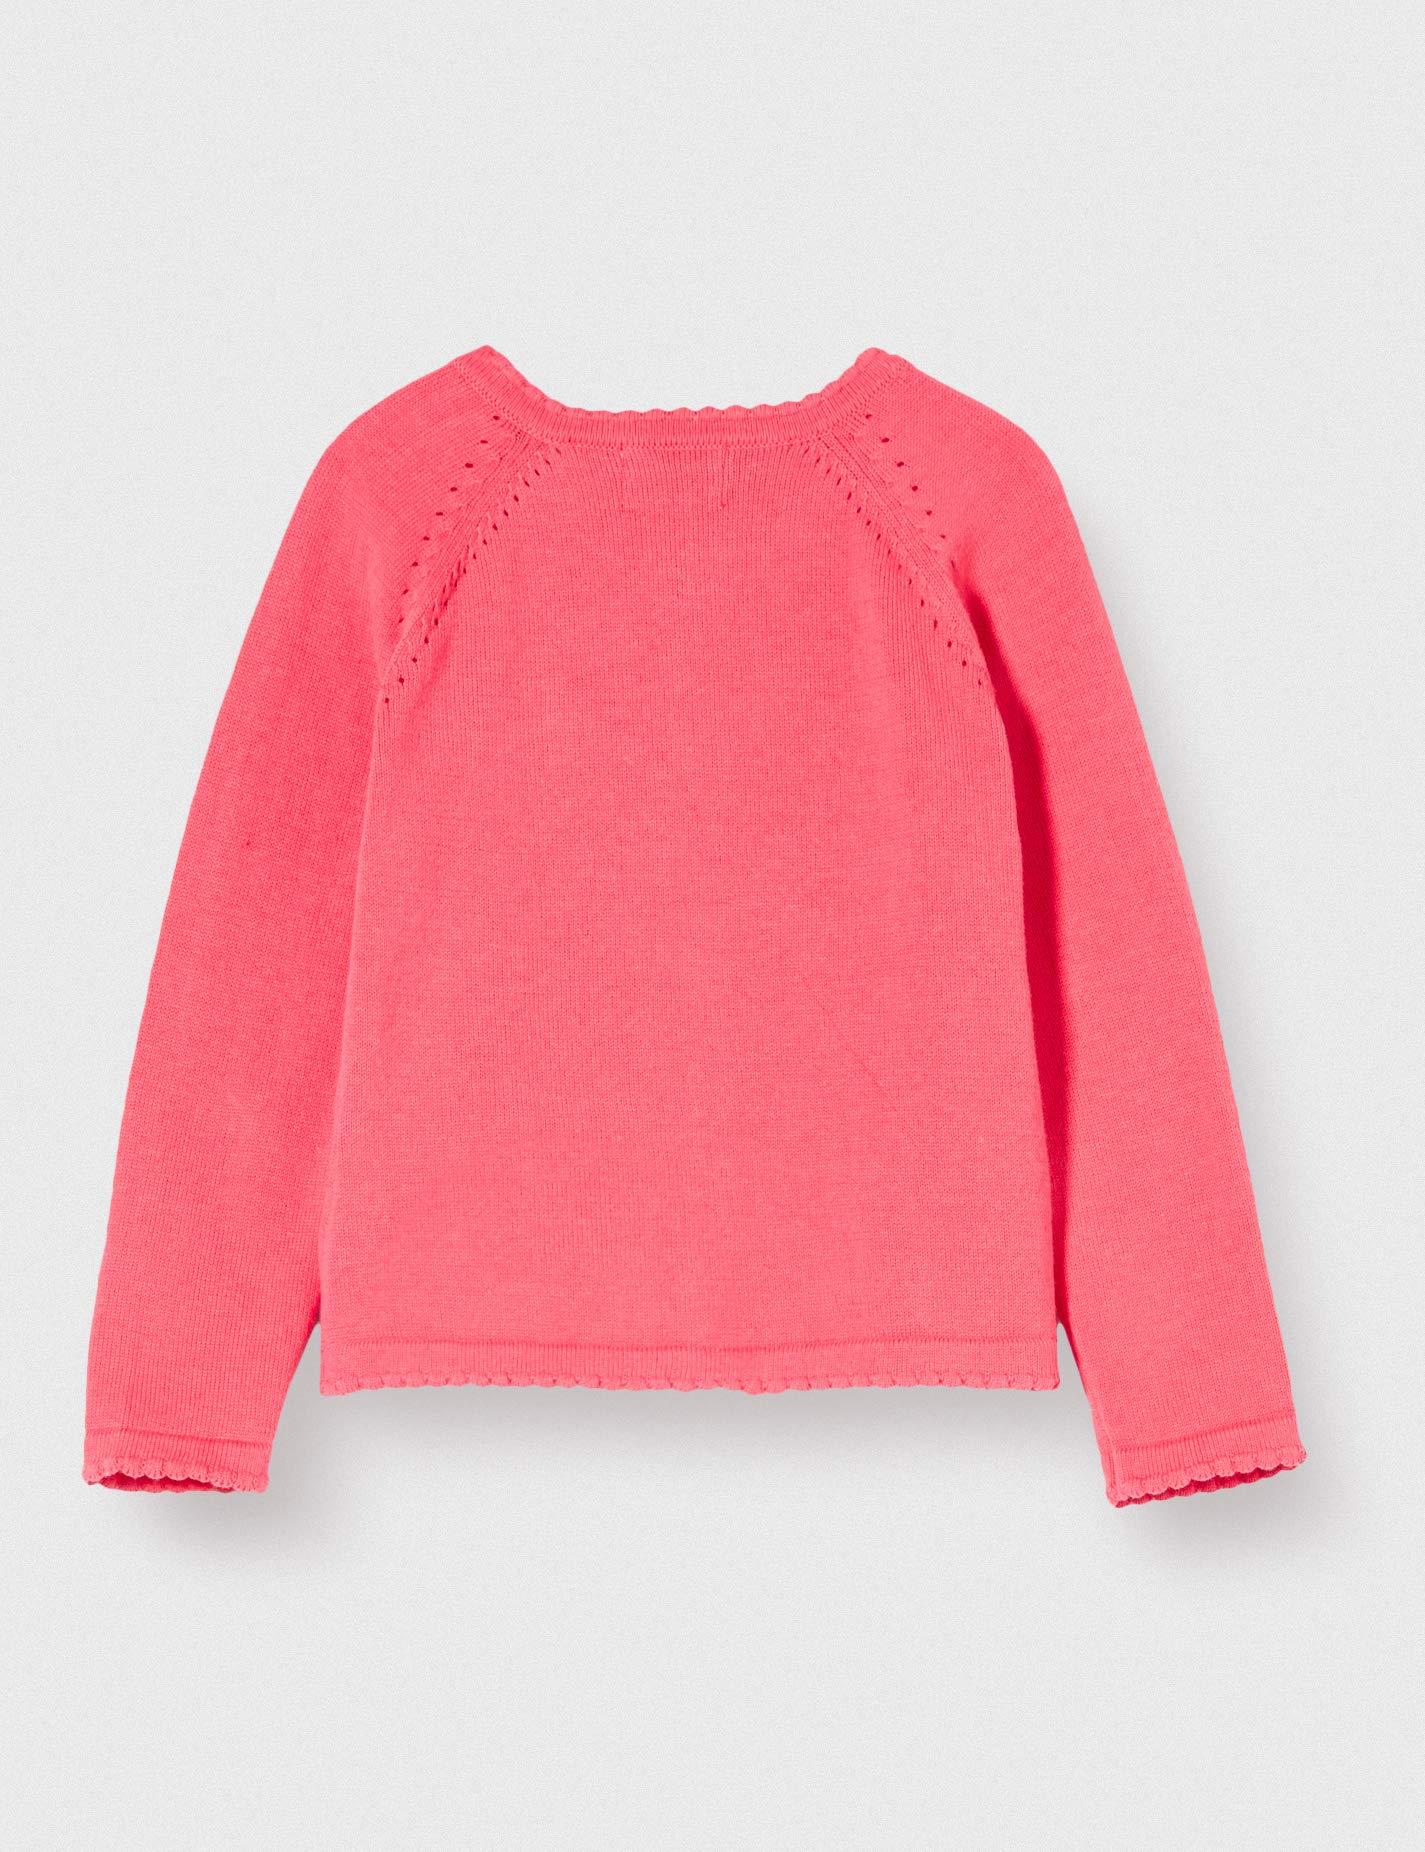 Noa Noa Miniature Baby Basic Light Knit Chaqueta Punto para Bebés 3